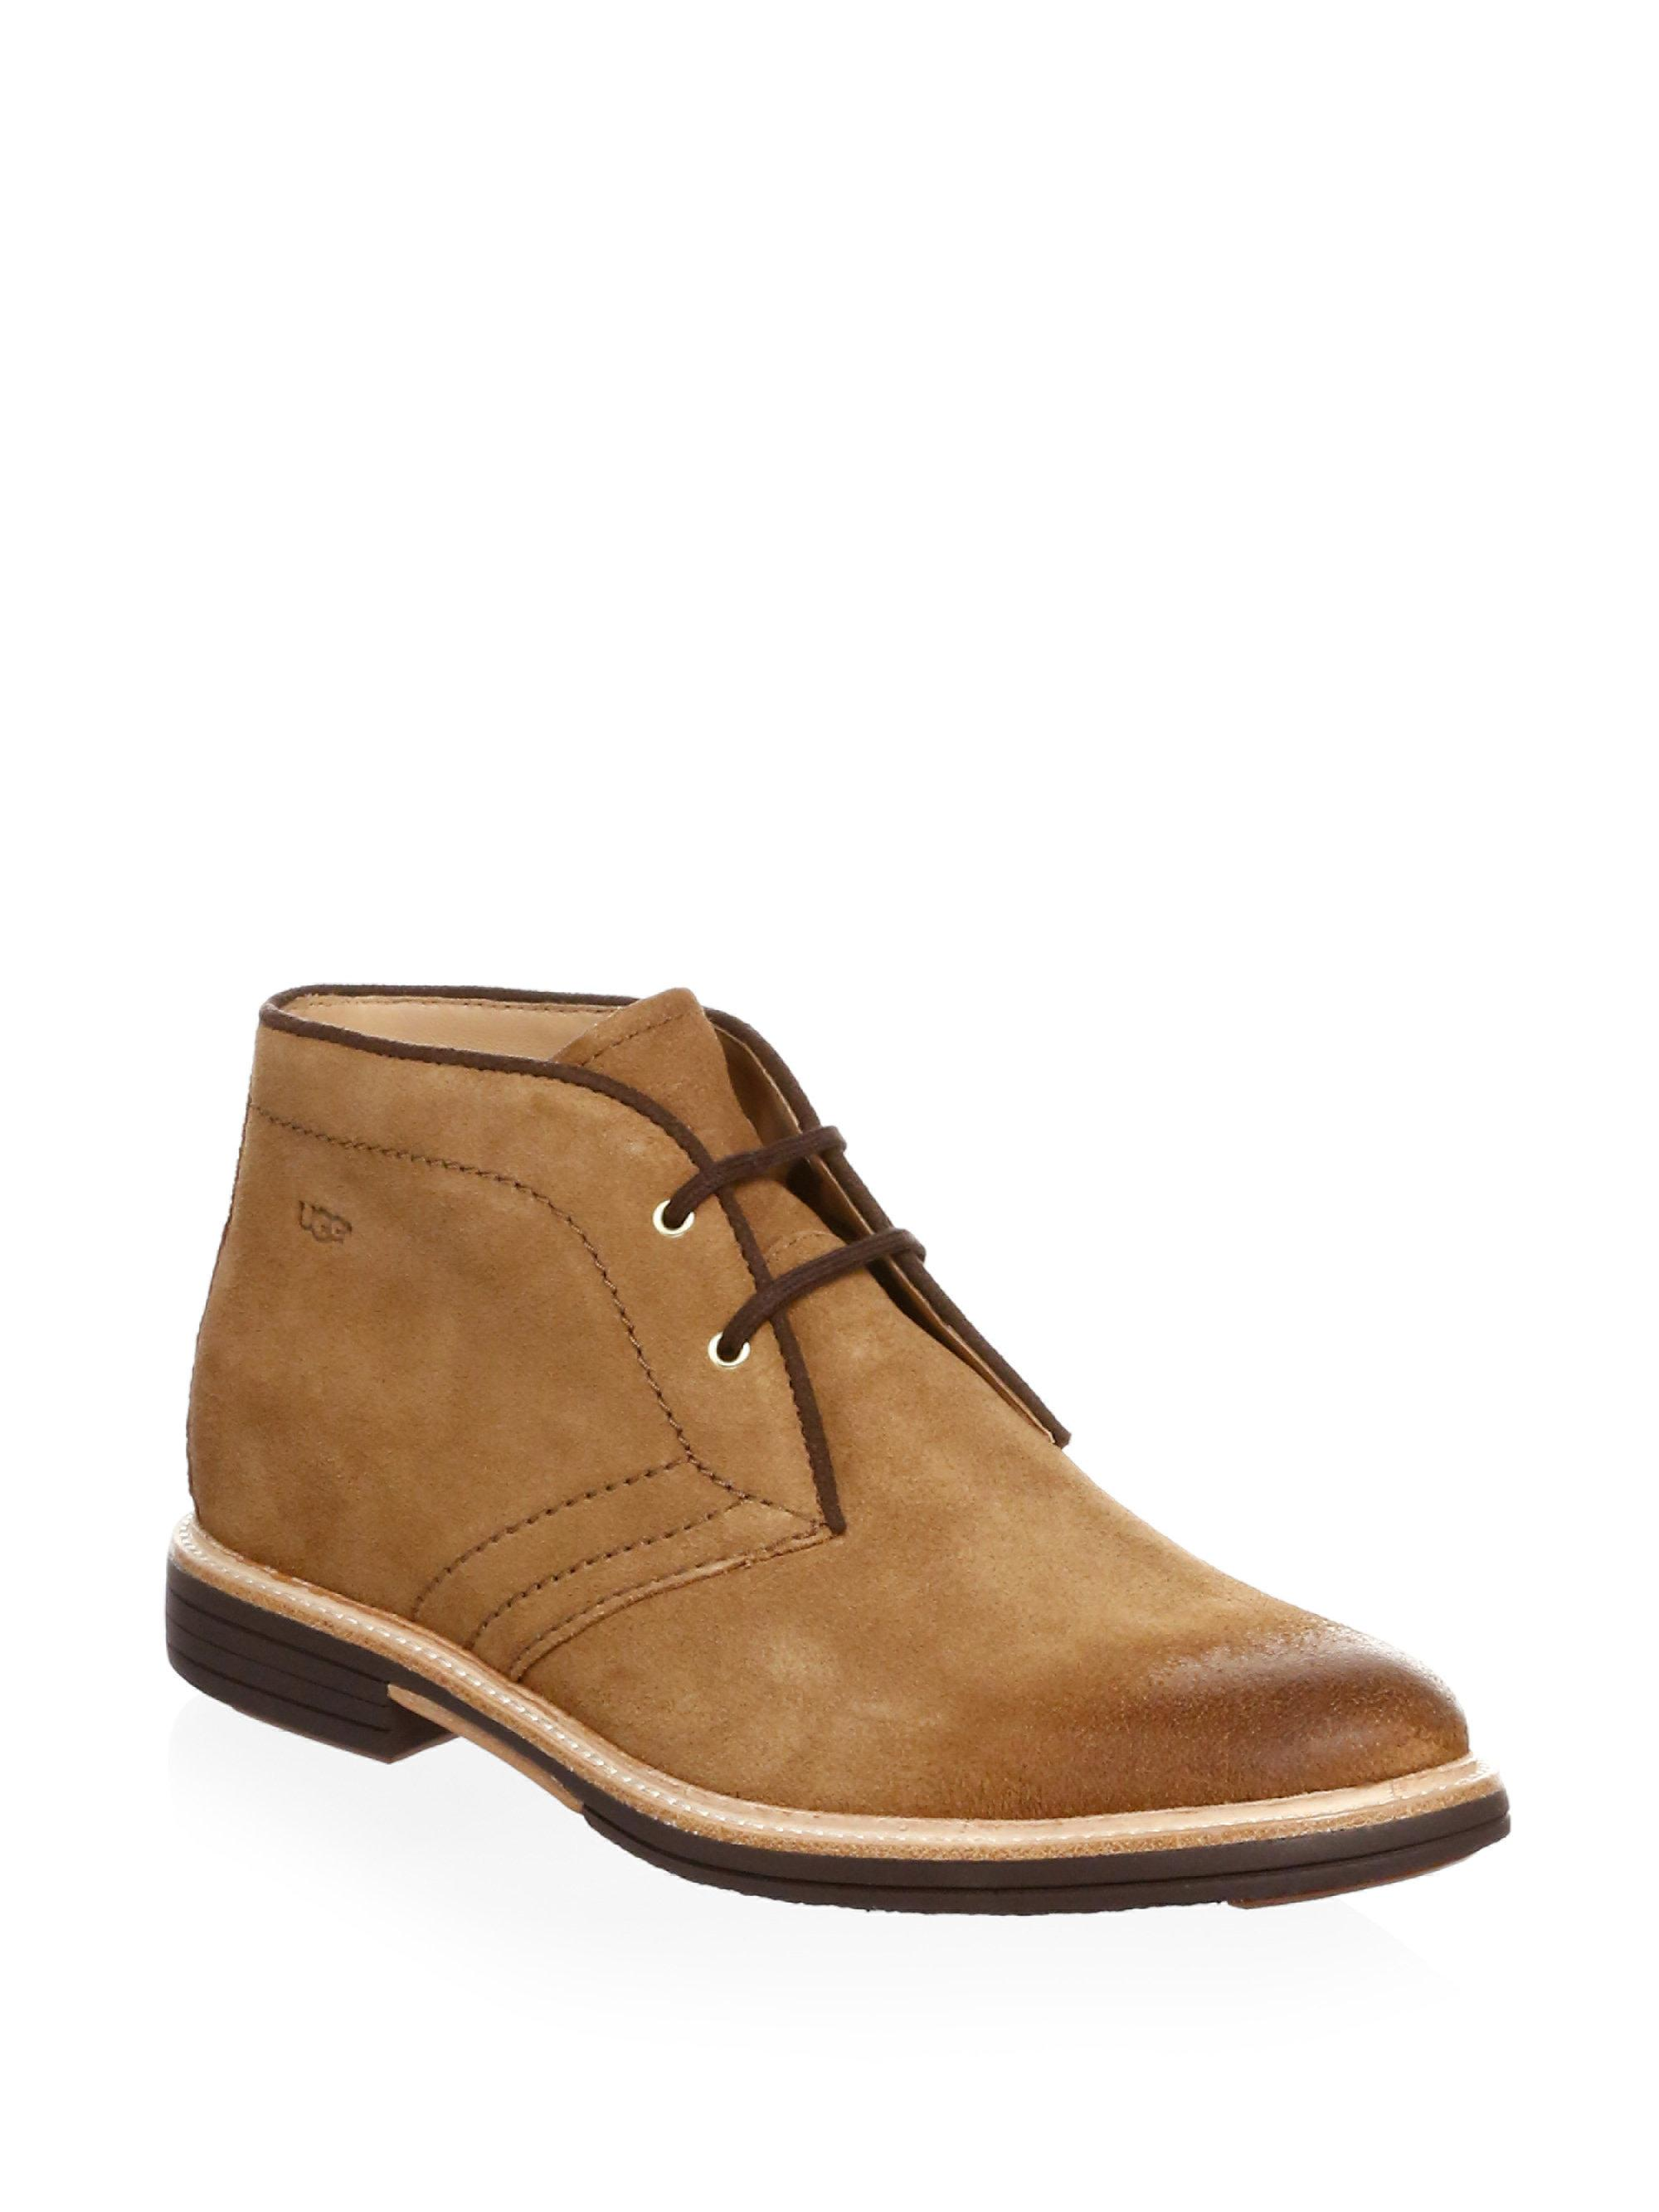 UGG Dagmann Chukka Suede Ankle Boots 59iNwK7